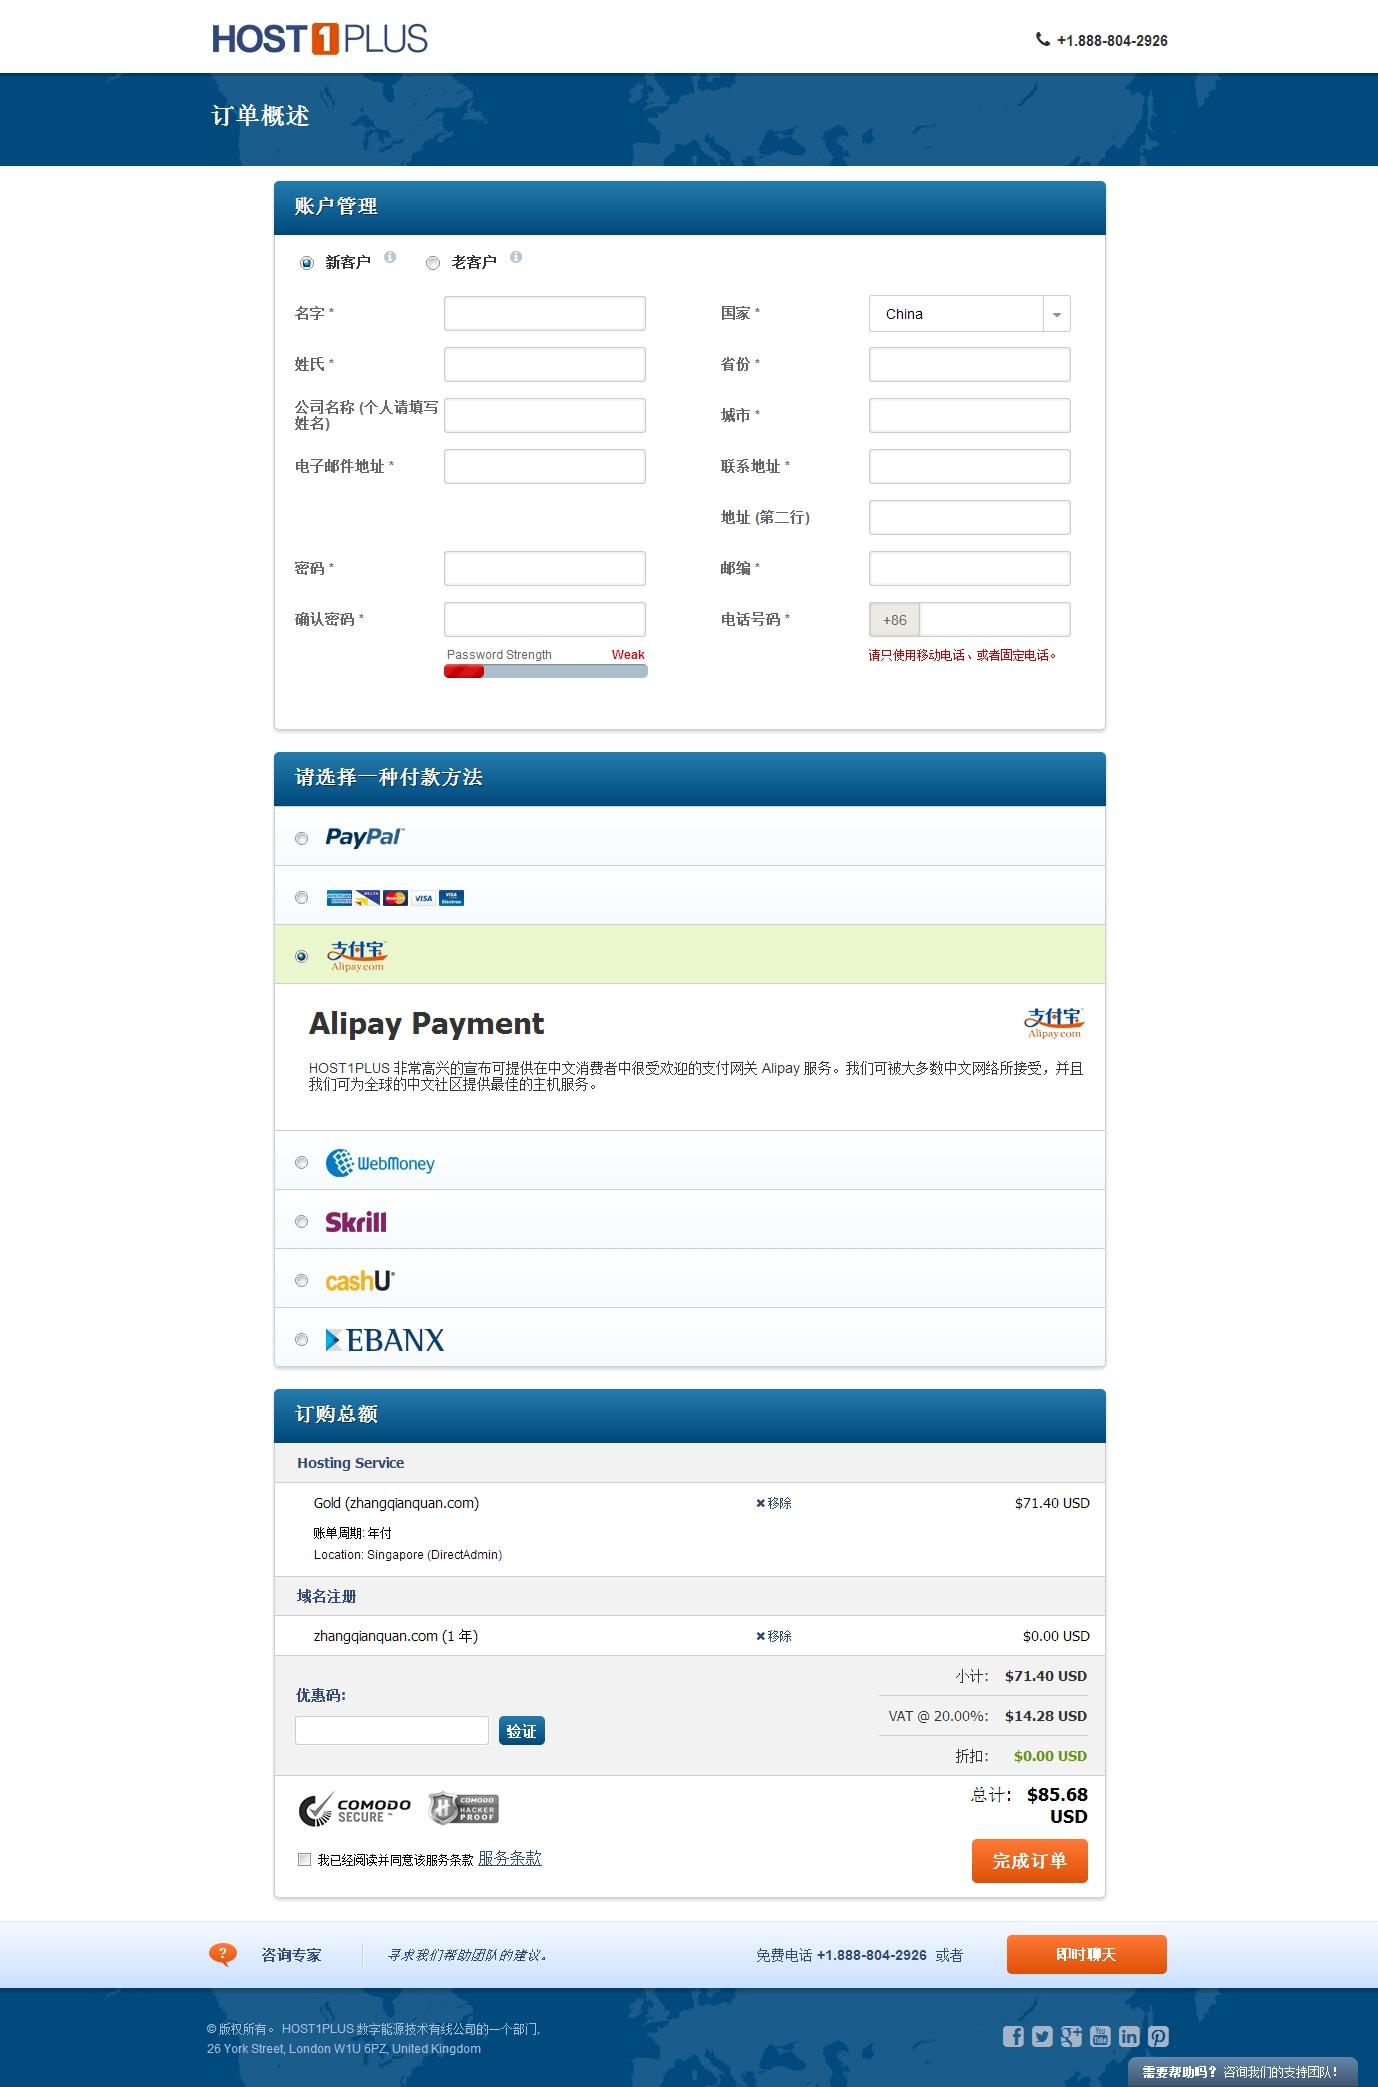 Host1Plus支付信息页面